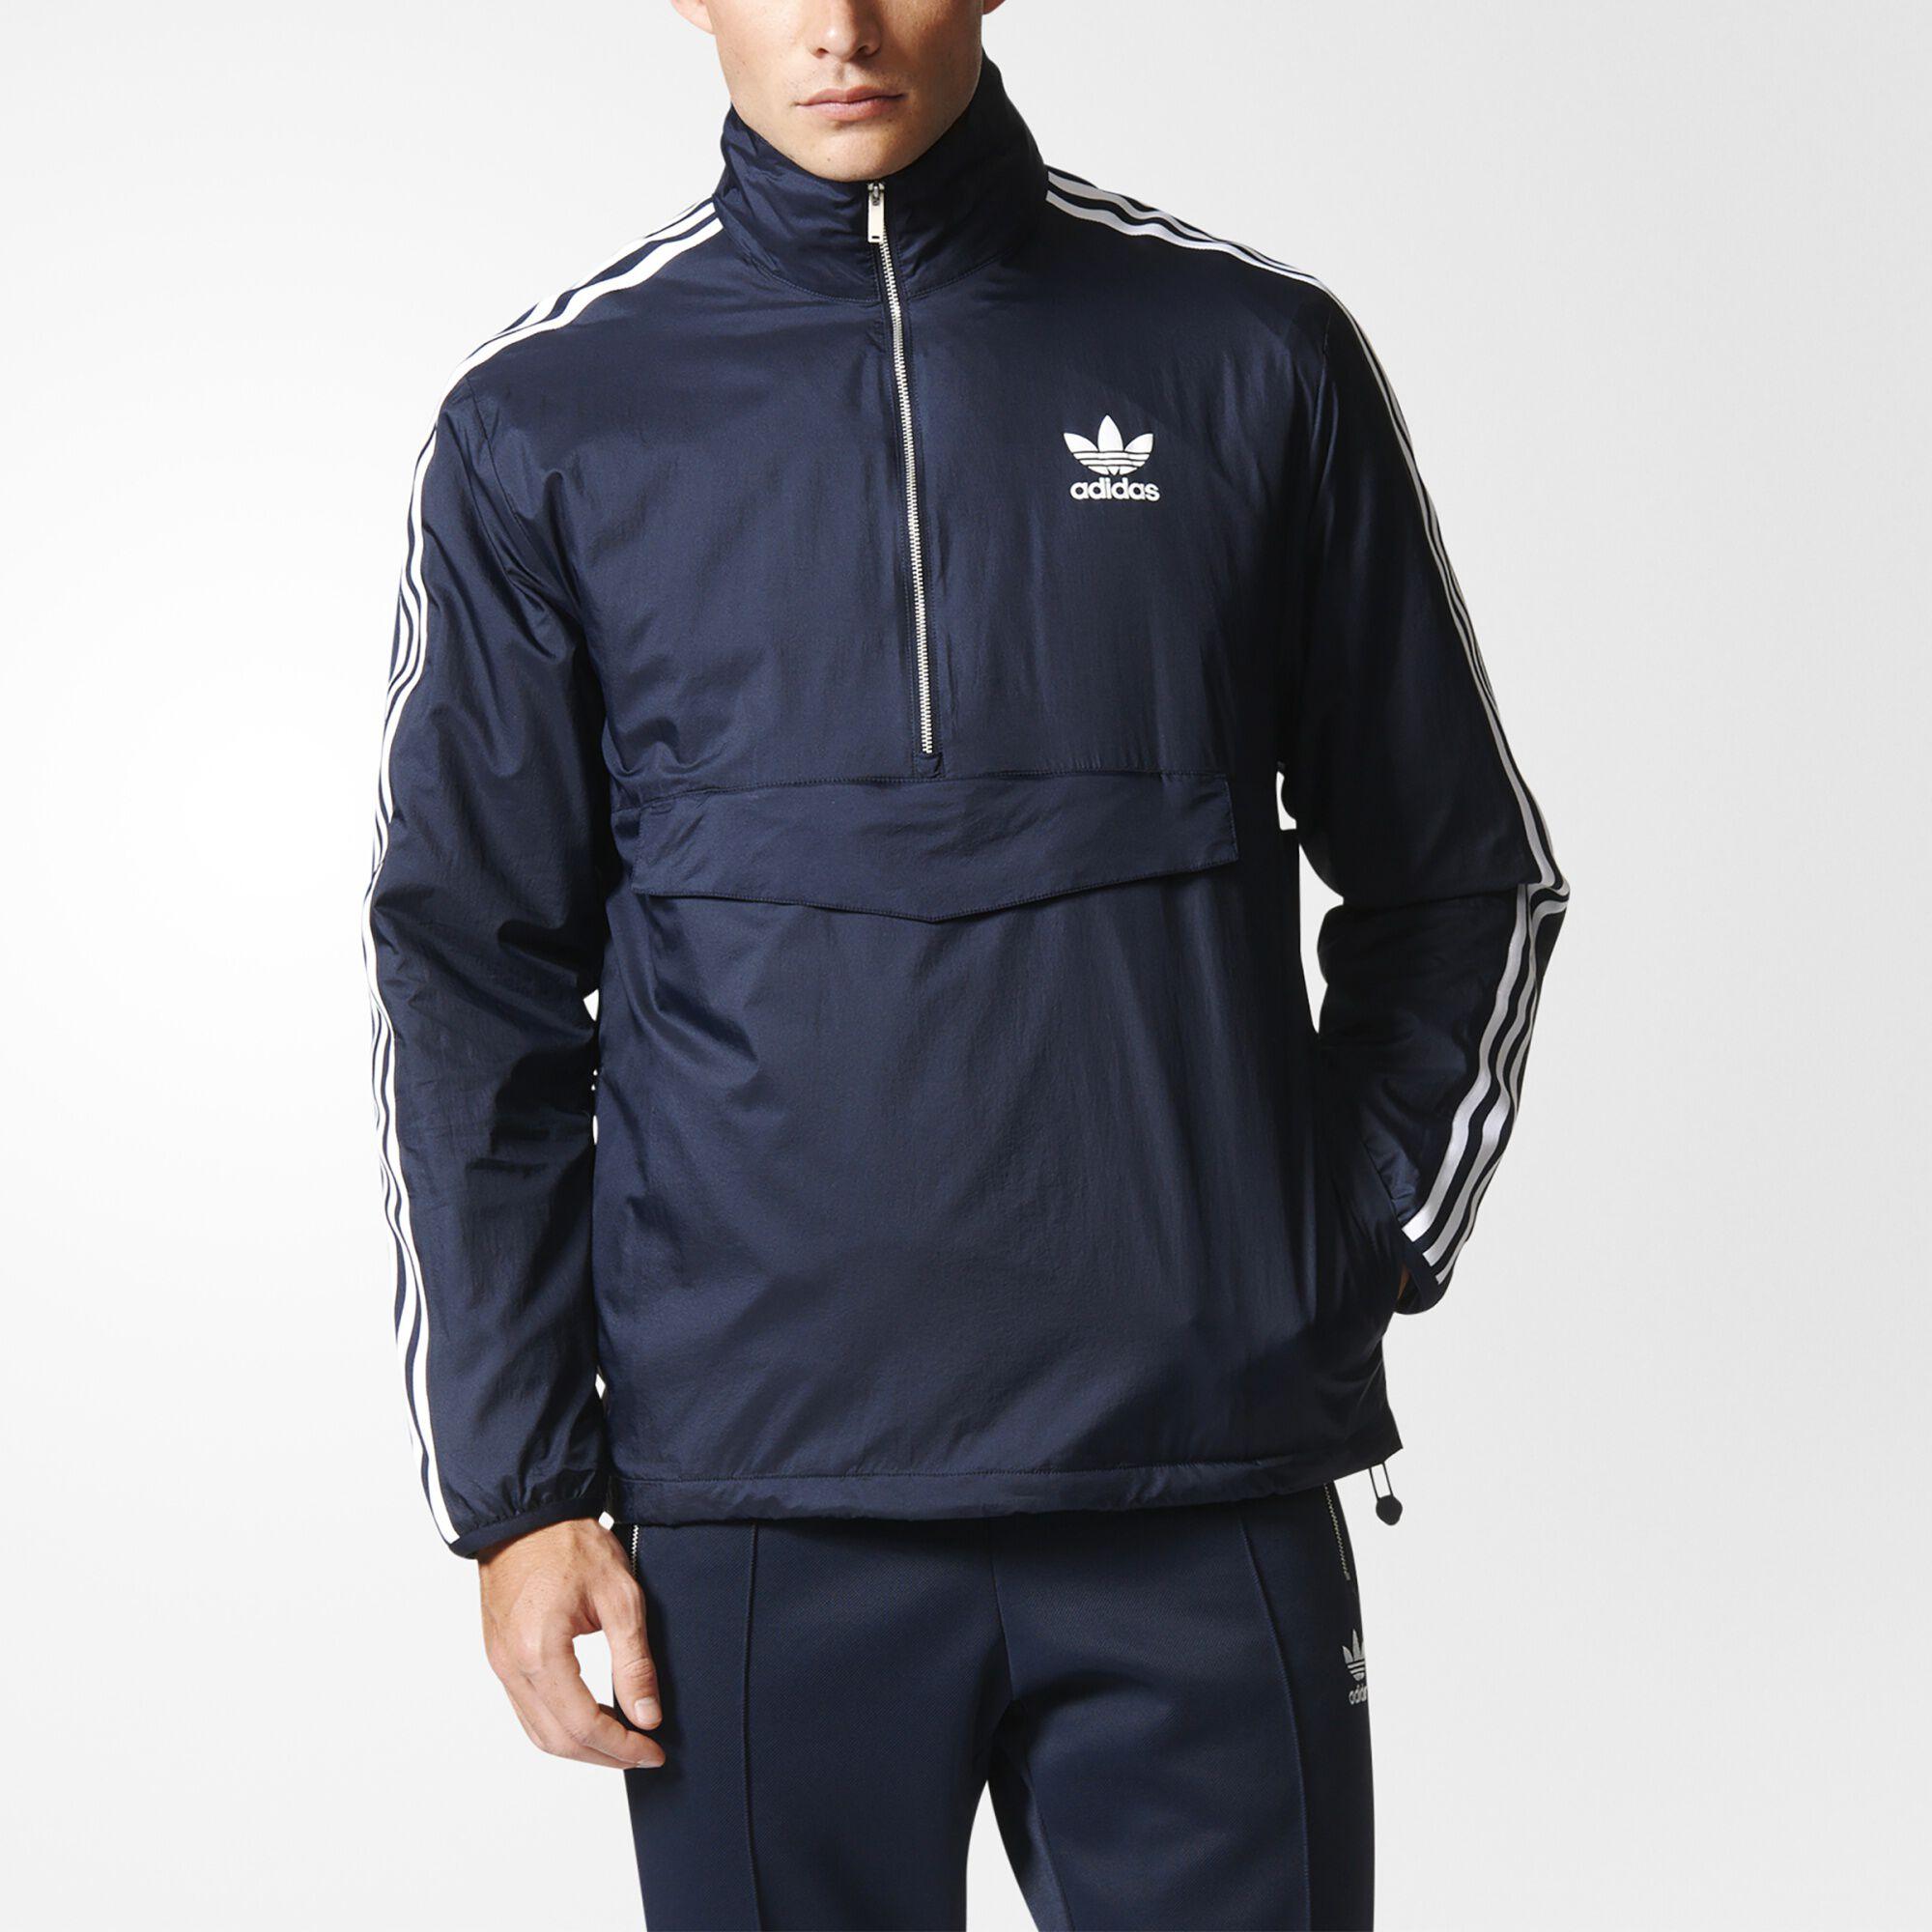 2f1eb83e0855 custom adidas jacket